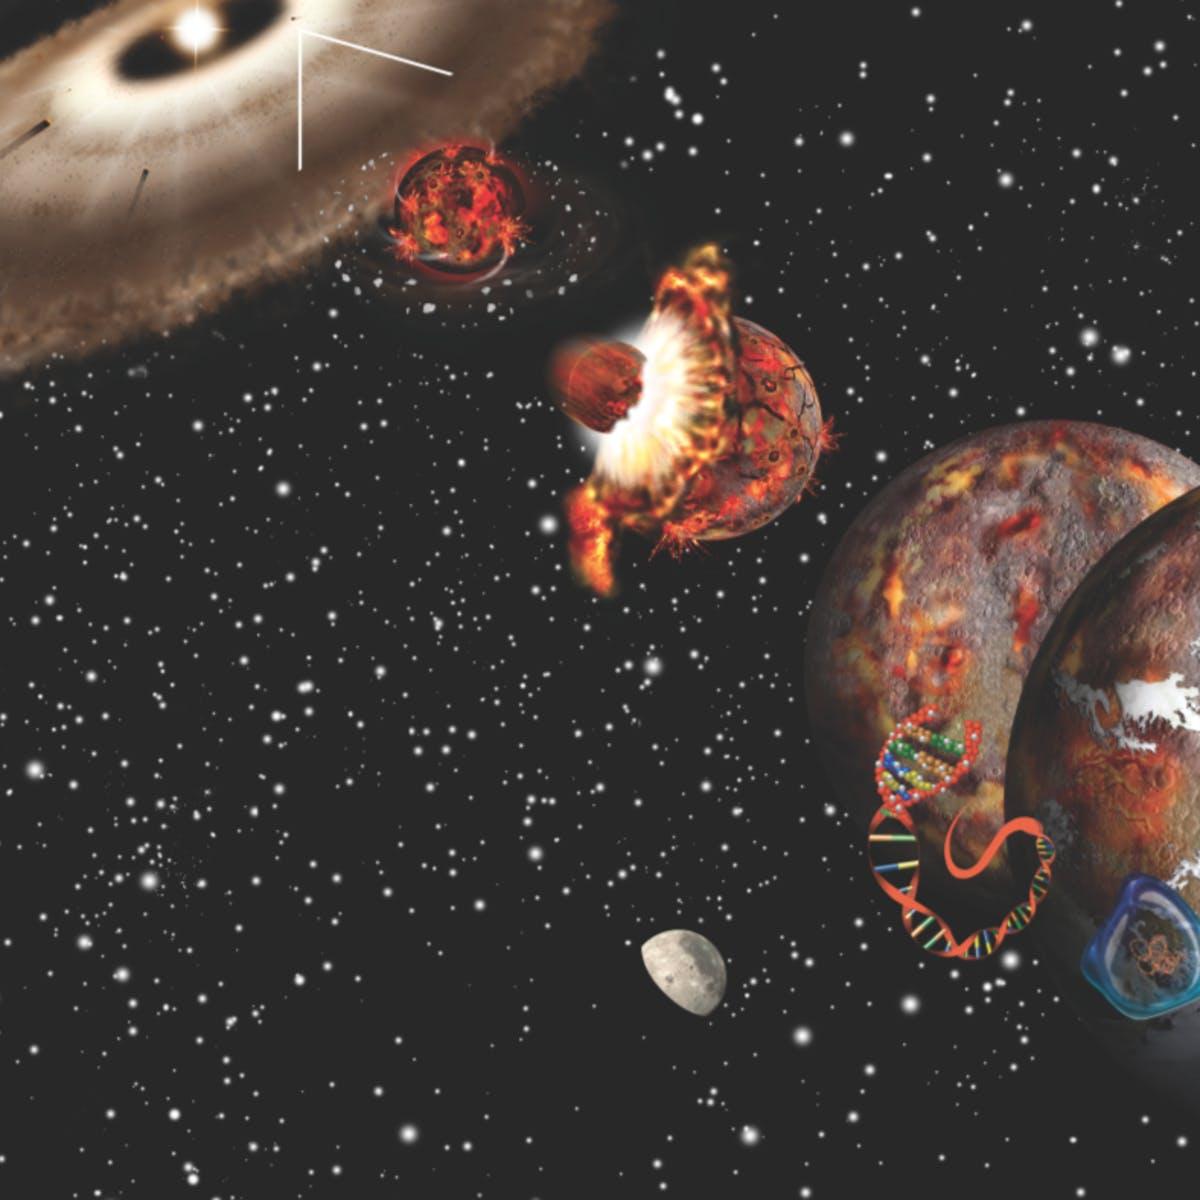 Origens da Vida no Contexto Cósmico